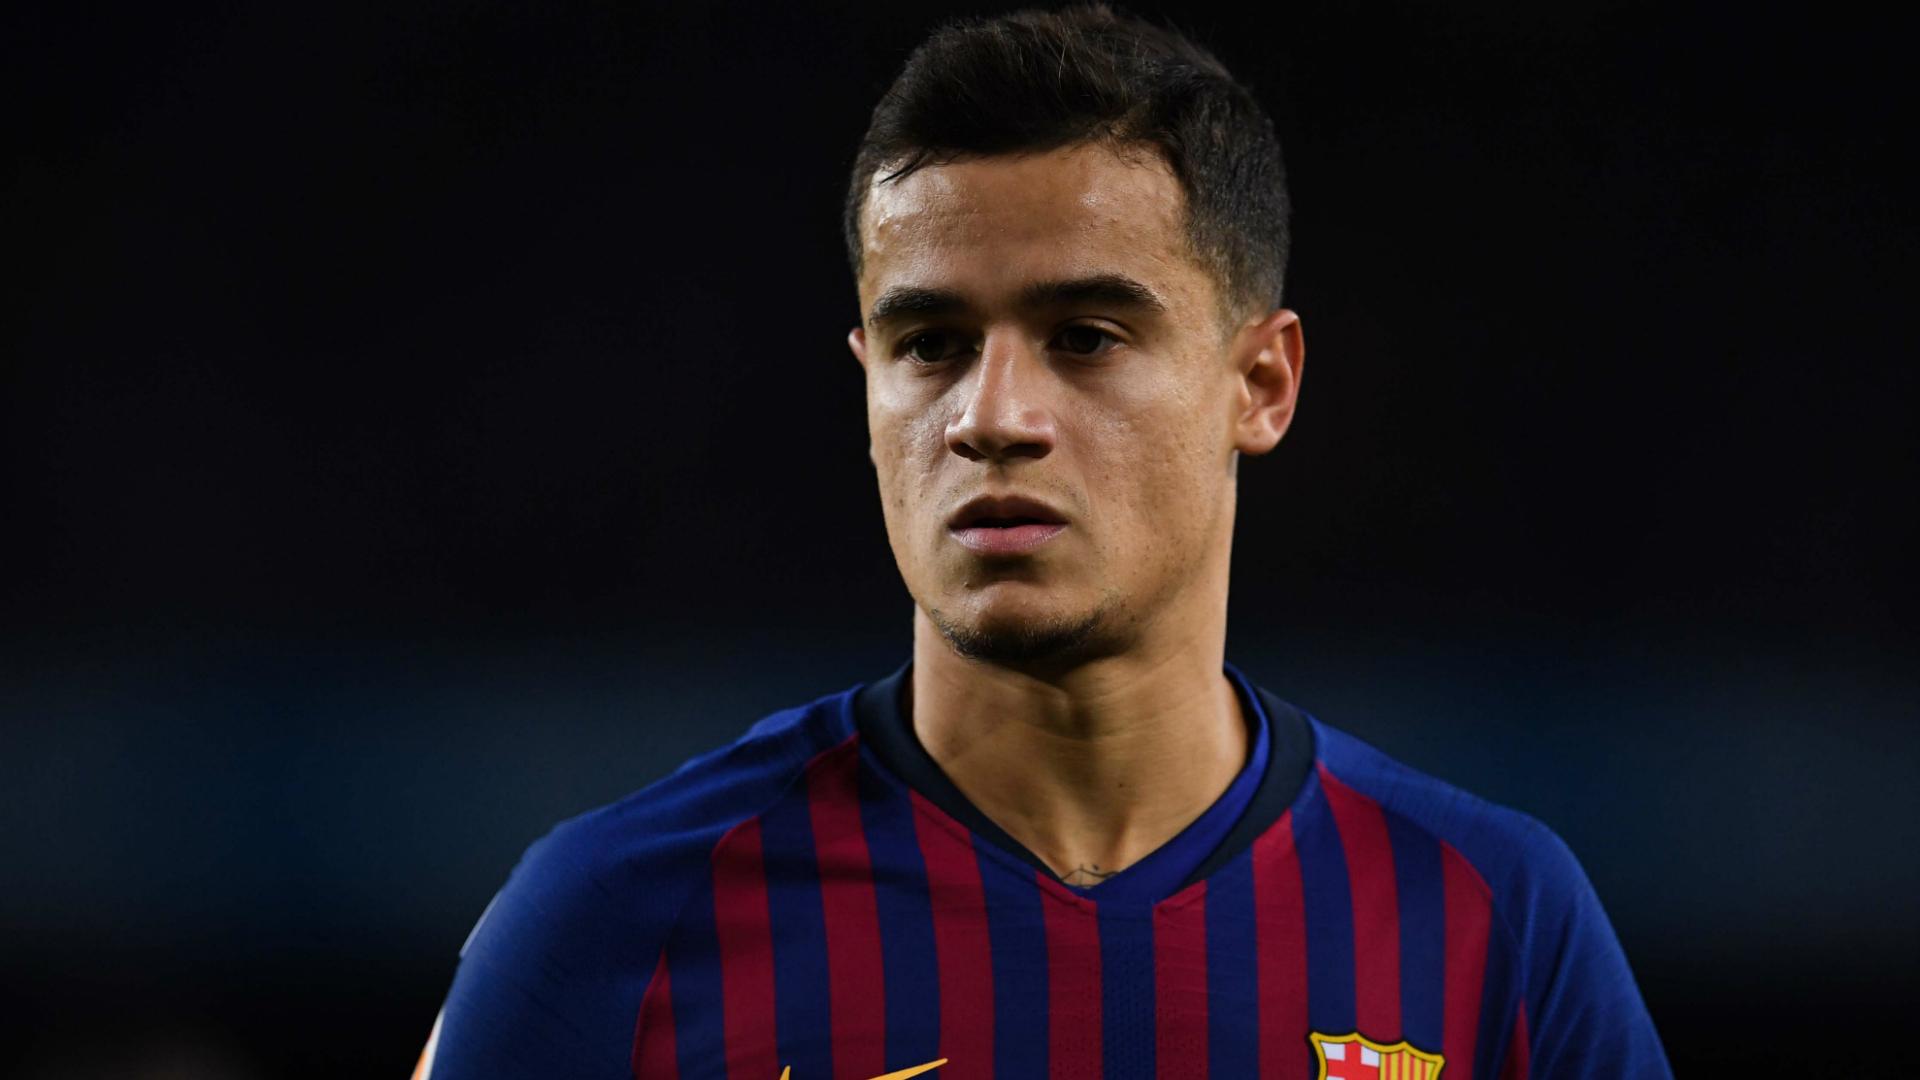 Klopp dismisses Coutinho rumours